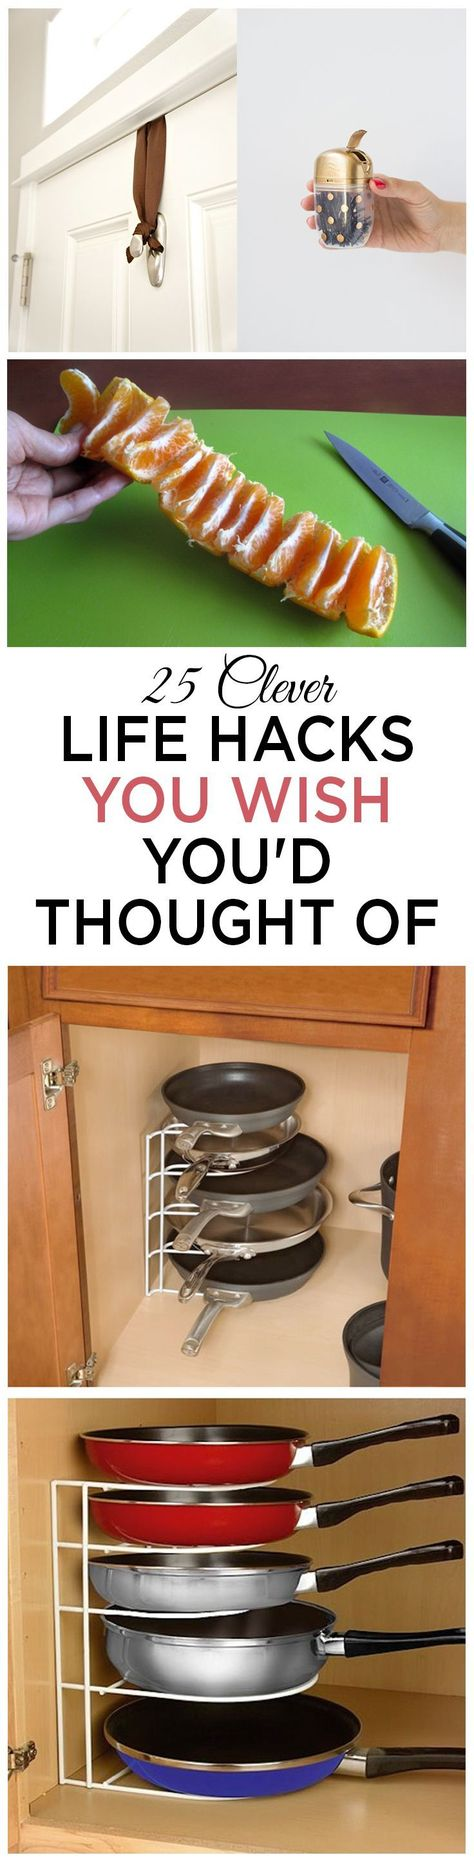 Clever life hacks, life hacks, life tips, clever life ideas, life, popular pin. #LifeHacks #LifeTips #TipsandTricks #MakeLifeEasier